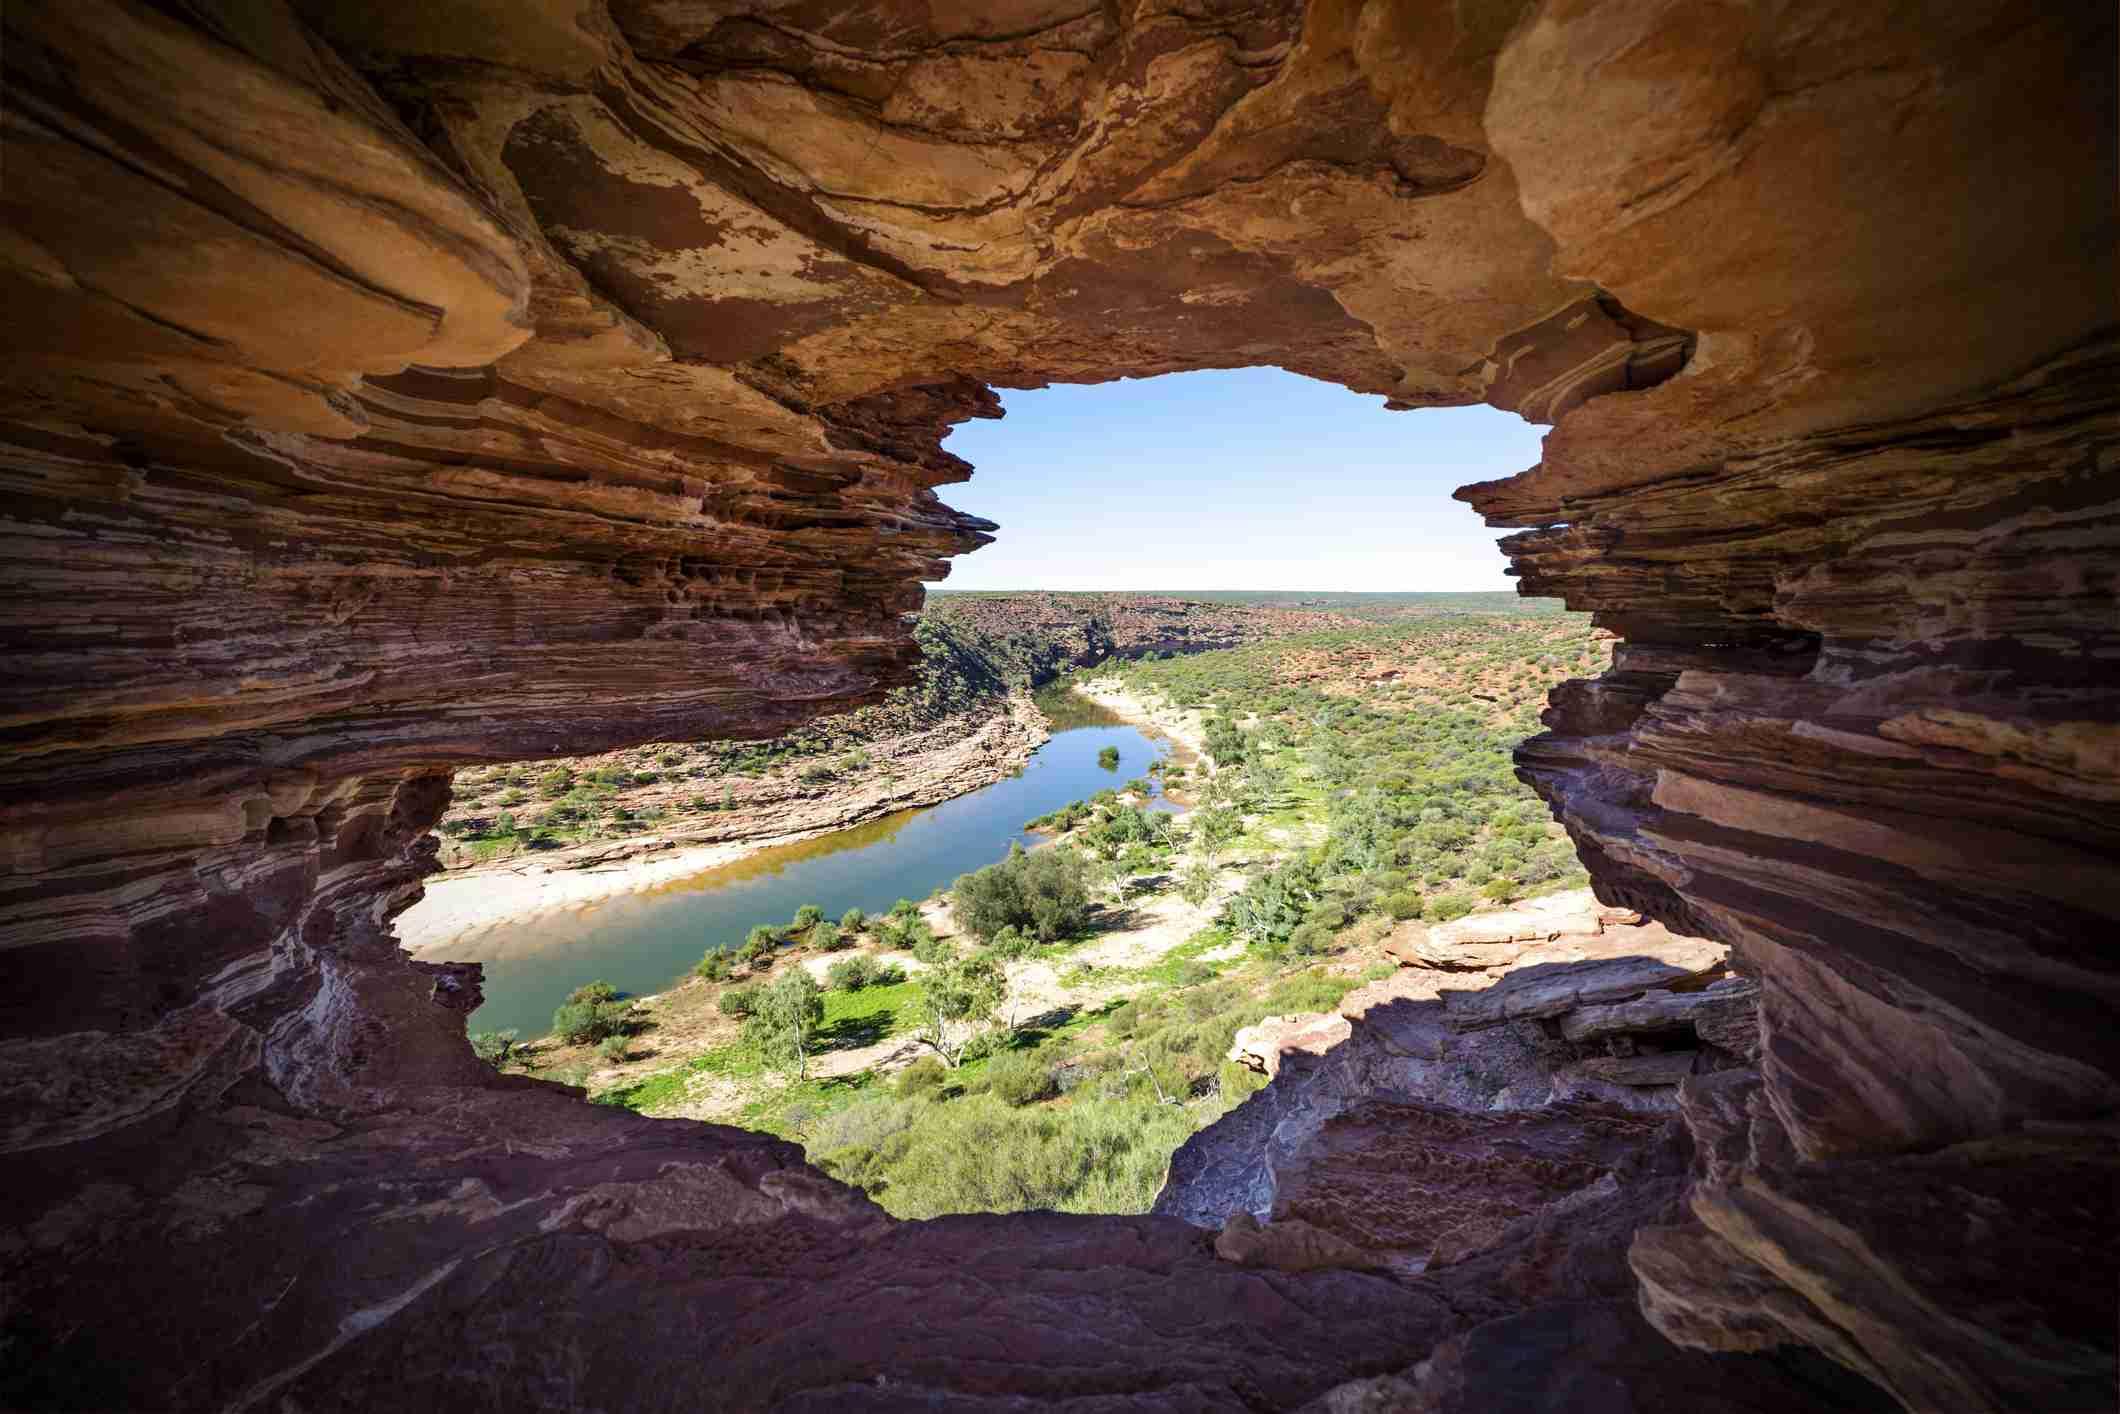 Looking through Nature's Window in Kalbarri National Park, Australia